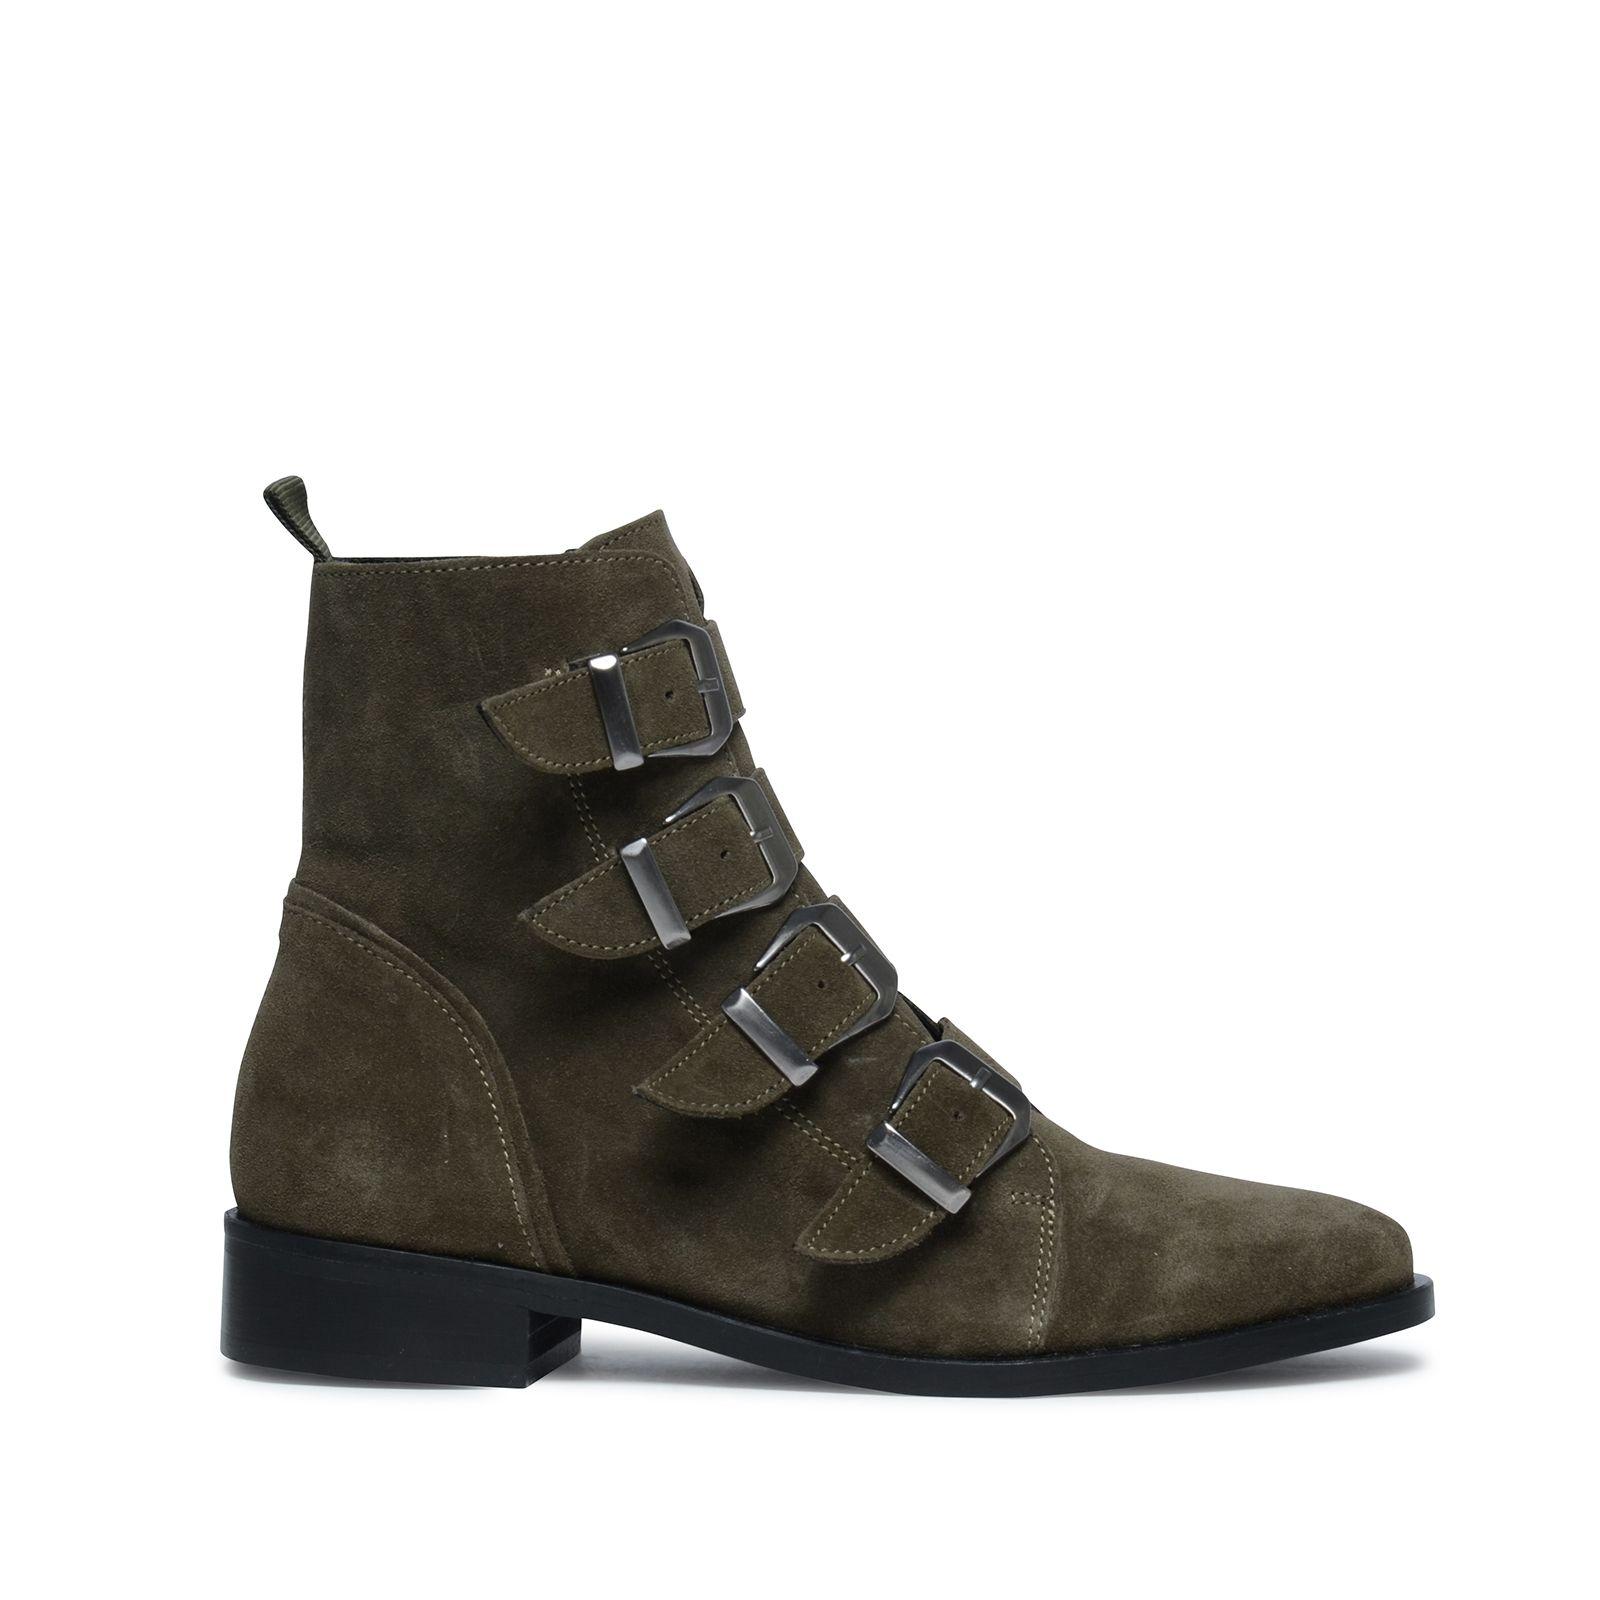 Dames schoenen online shoppen SACHA   Schoenen dames